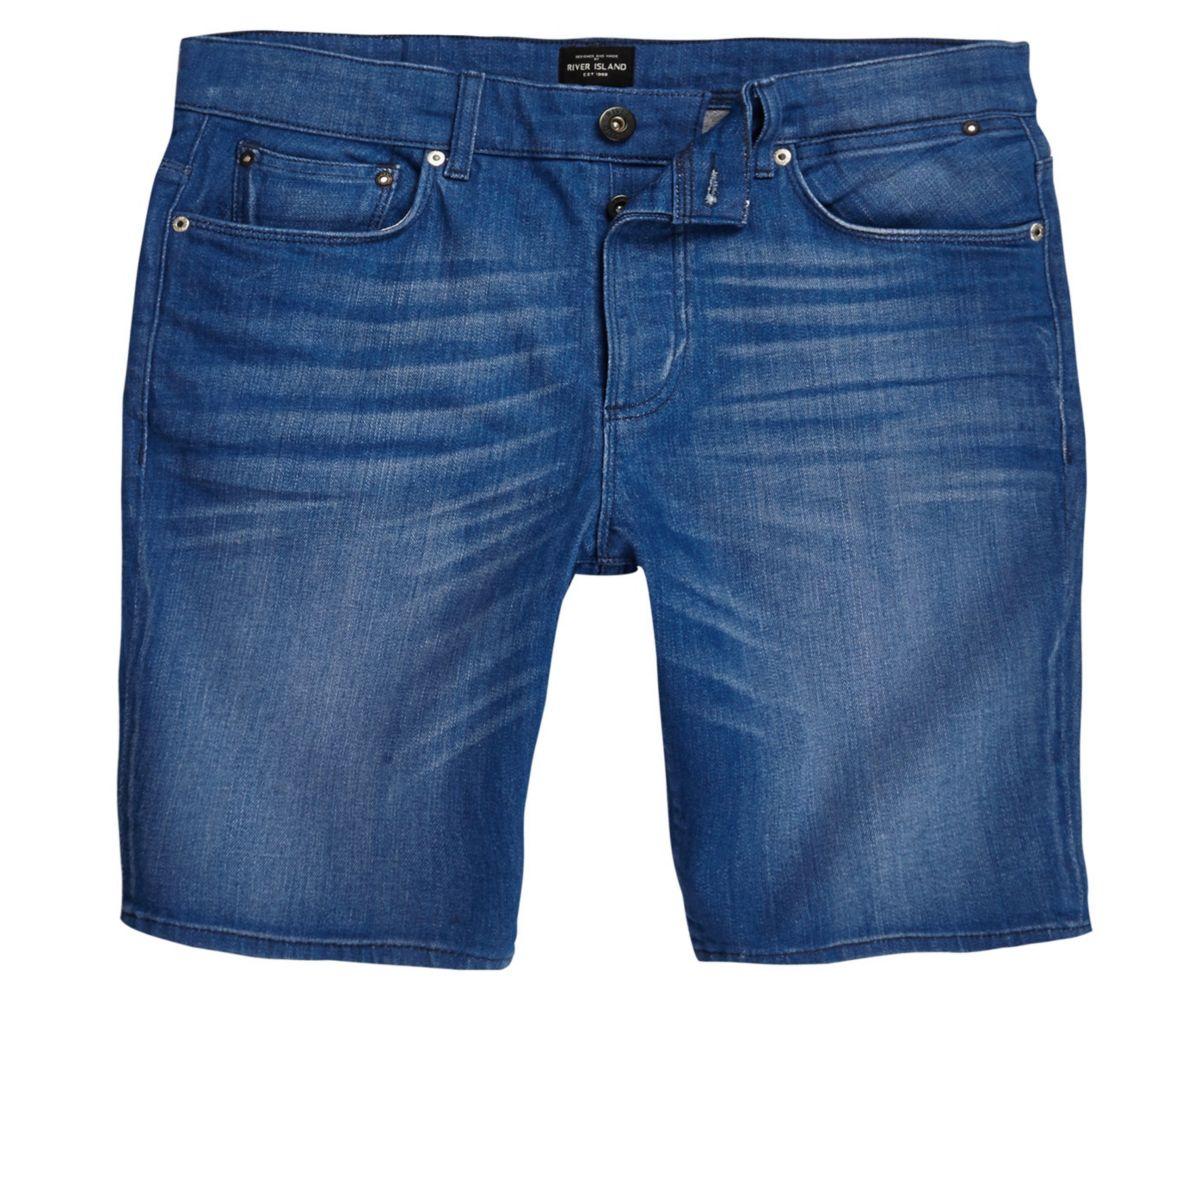 Short en jean bleu coupe skinny